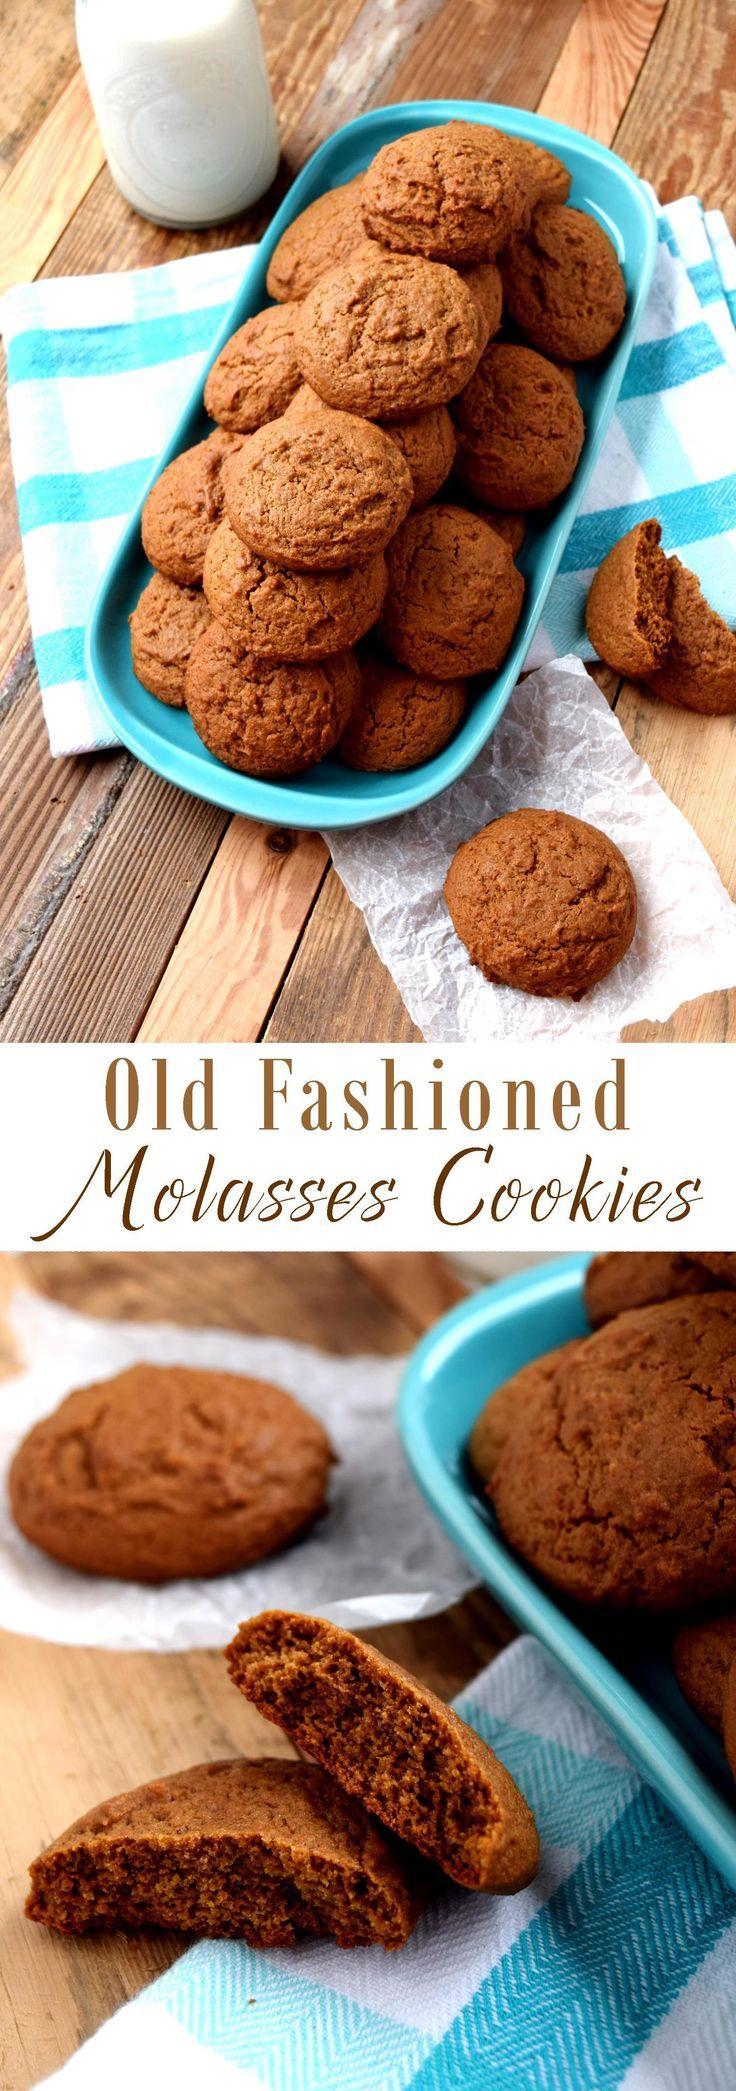 98 best Christmas cookies images on Pinterest | Cookies, Christmas ...